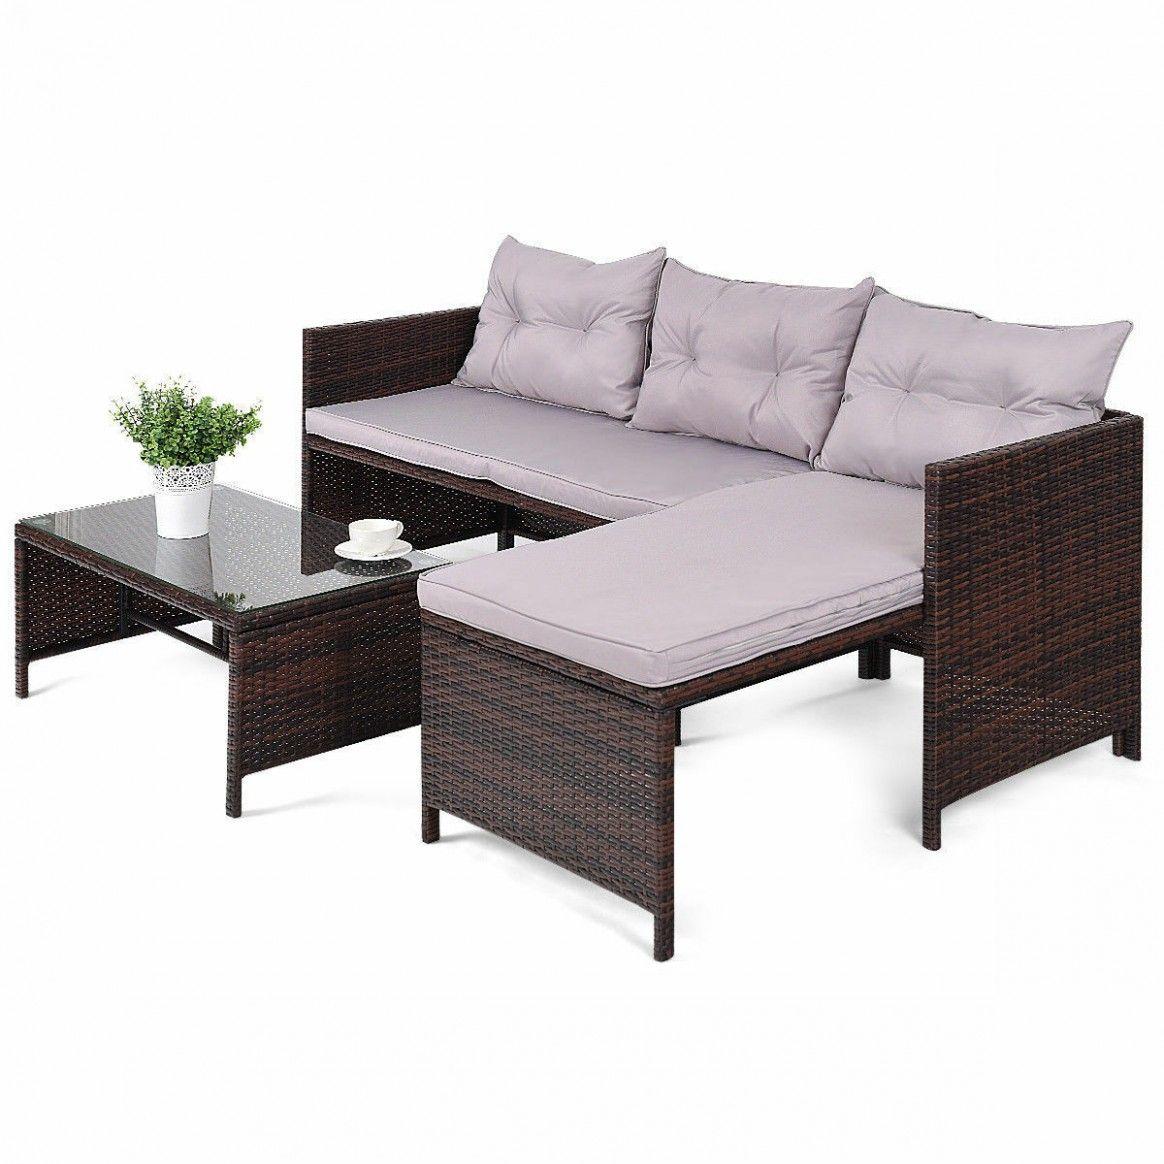 Used Rattan Garden Sofa in 10  Patio sofa set, Outdoor